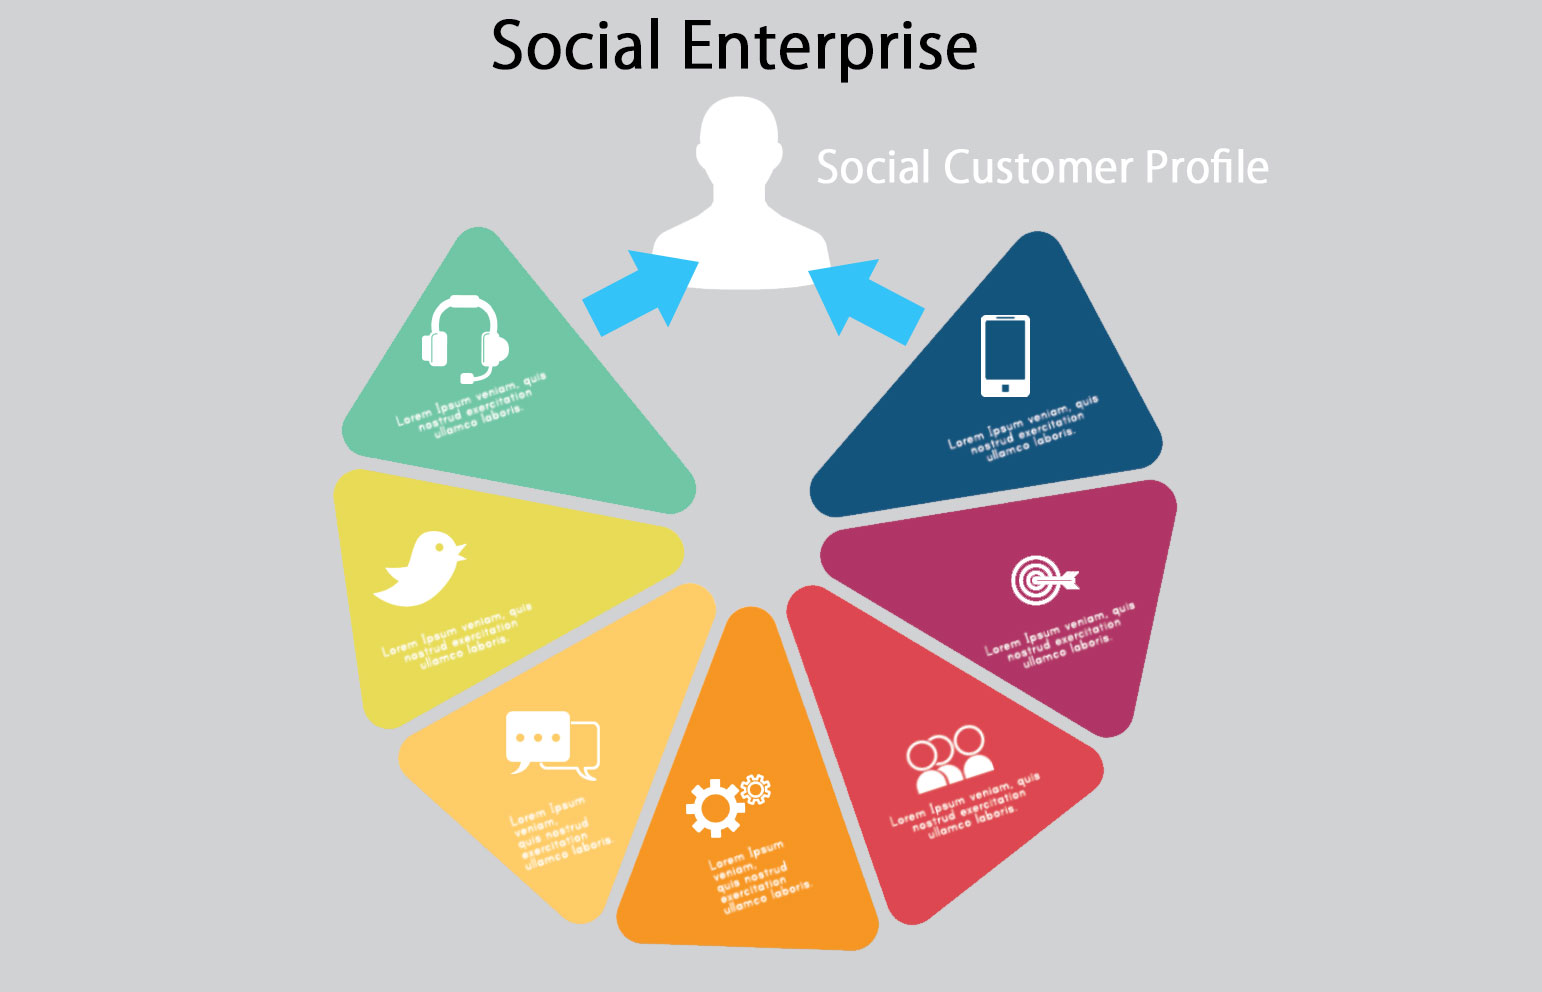 What is Salesforce technology - Social Enterprise